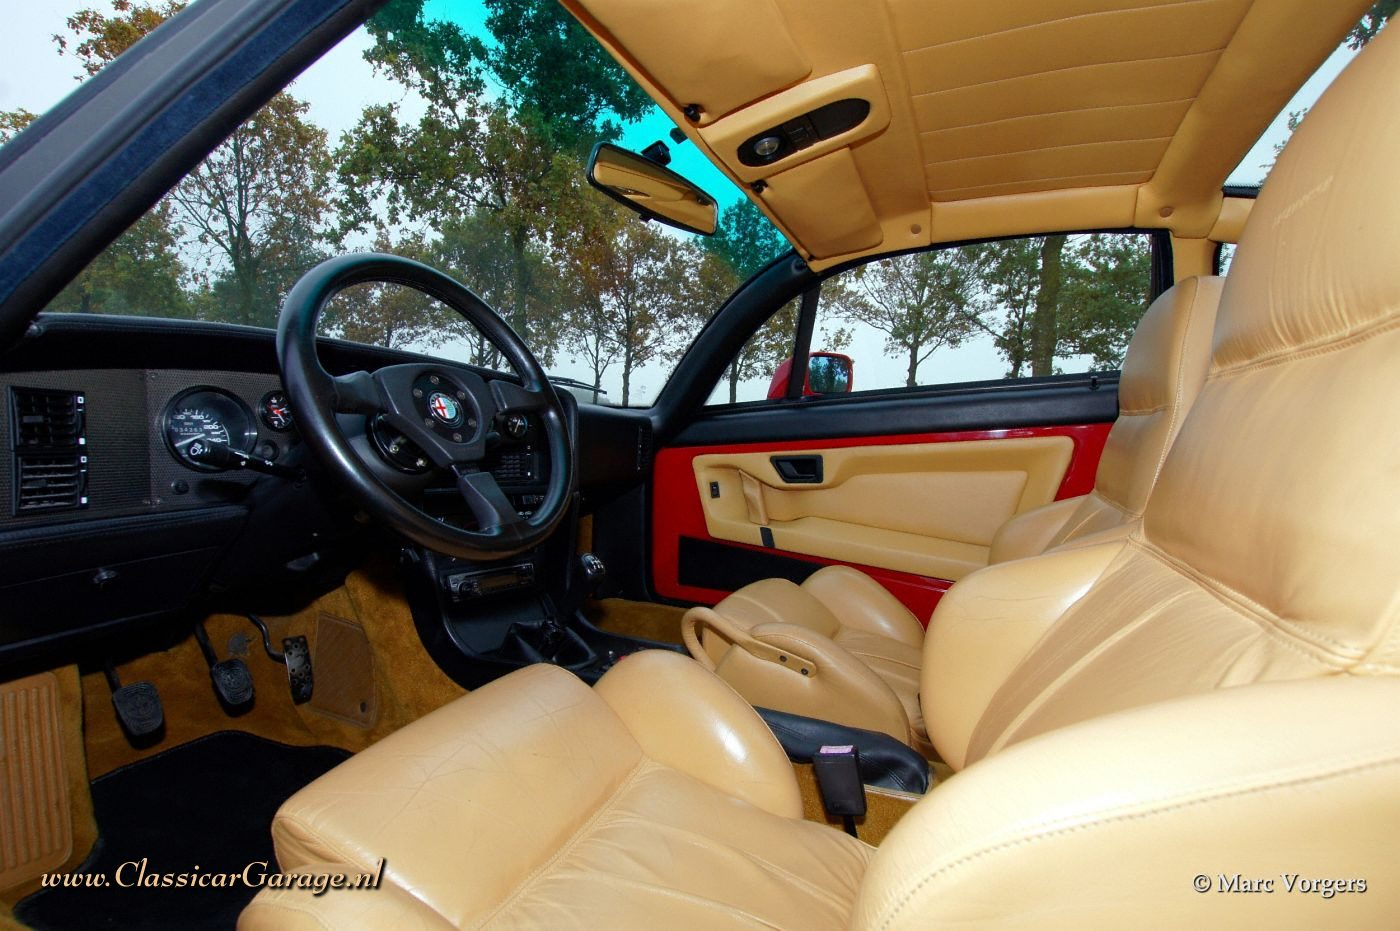 163515 Considering 1987 Quadrifoglio Advice Values further Saab 9000 in addition Volkswagen Passat Variant 1988 further Epcp 0510 Alfa Romeo Gtv6 Classic Car furthermore 1110 39 Det. on 1990 alfa romeo